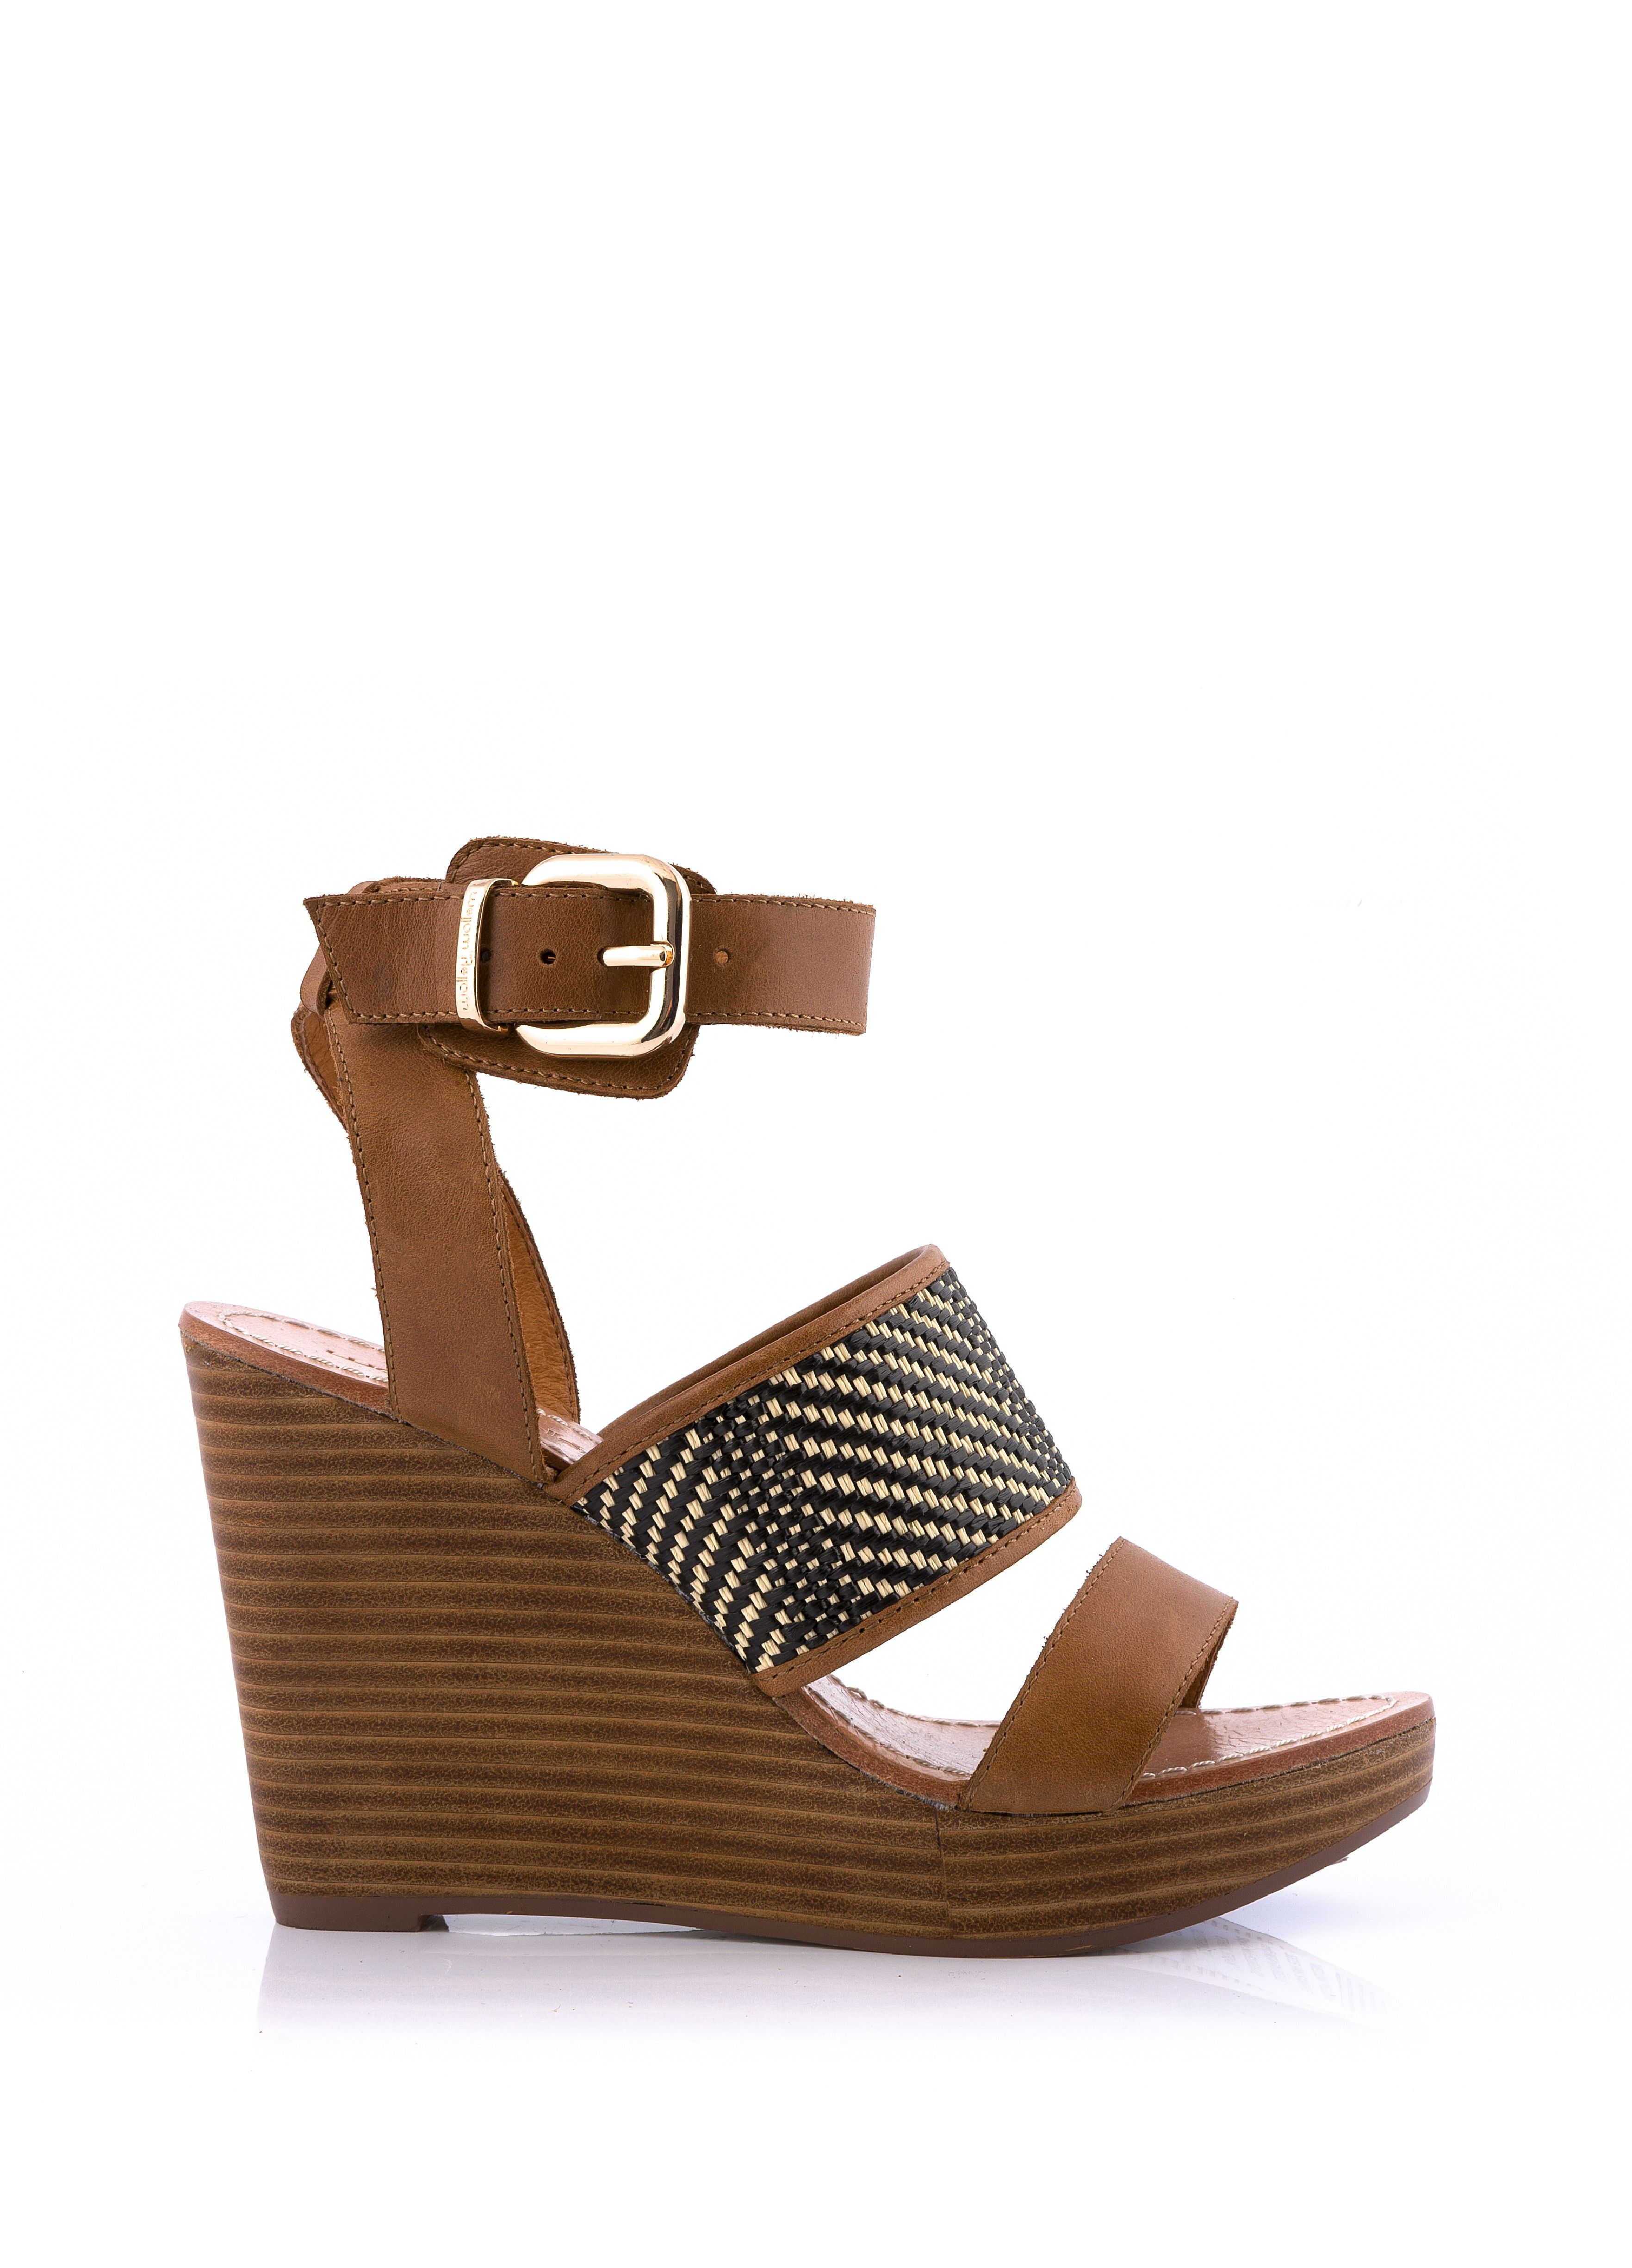 8no0kwp Chaussures Compensée Femmeshoes Saubelle Camel Sandale 0wPkN8nXZO